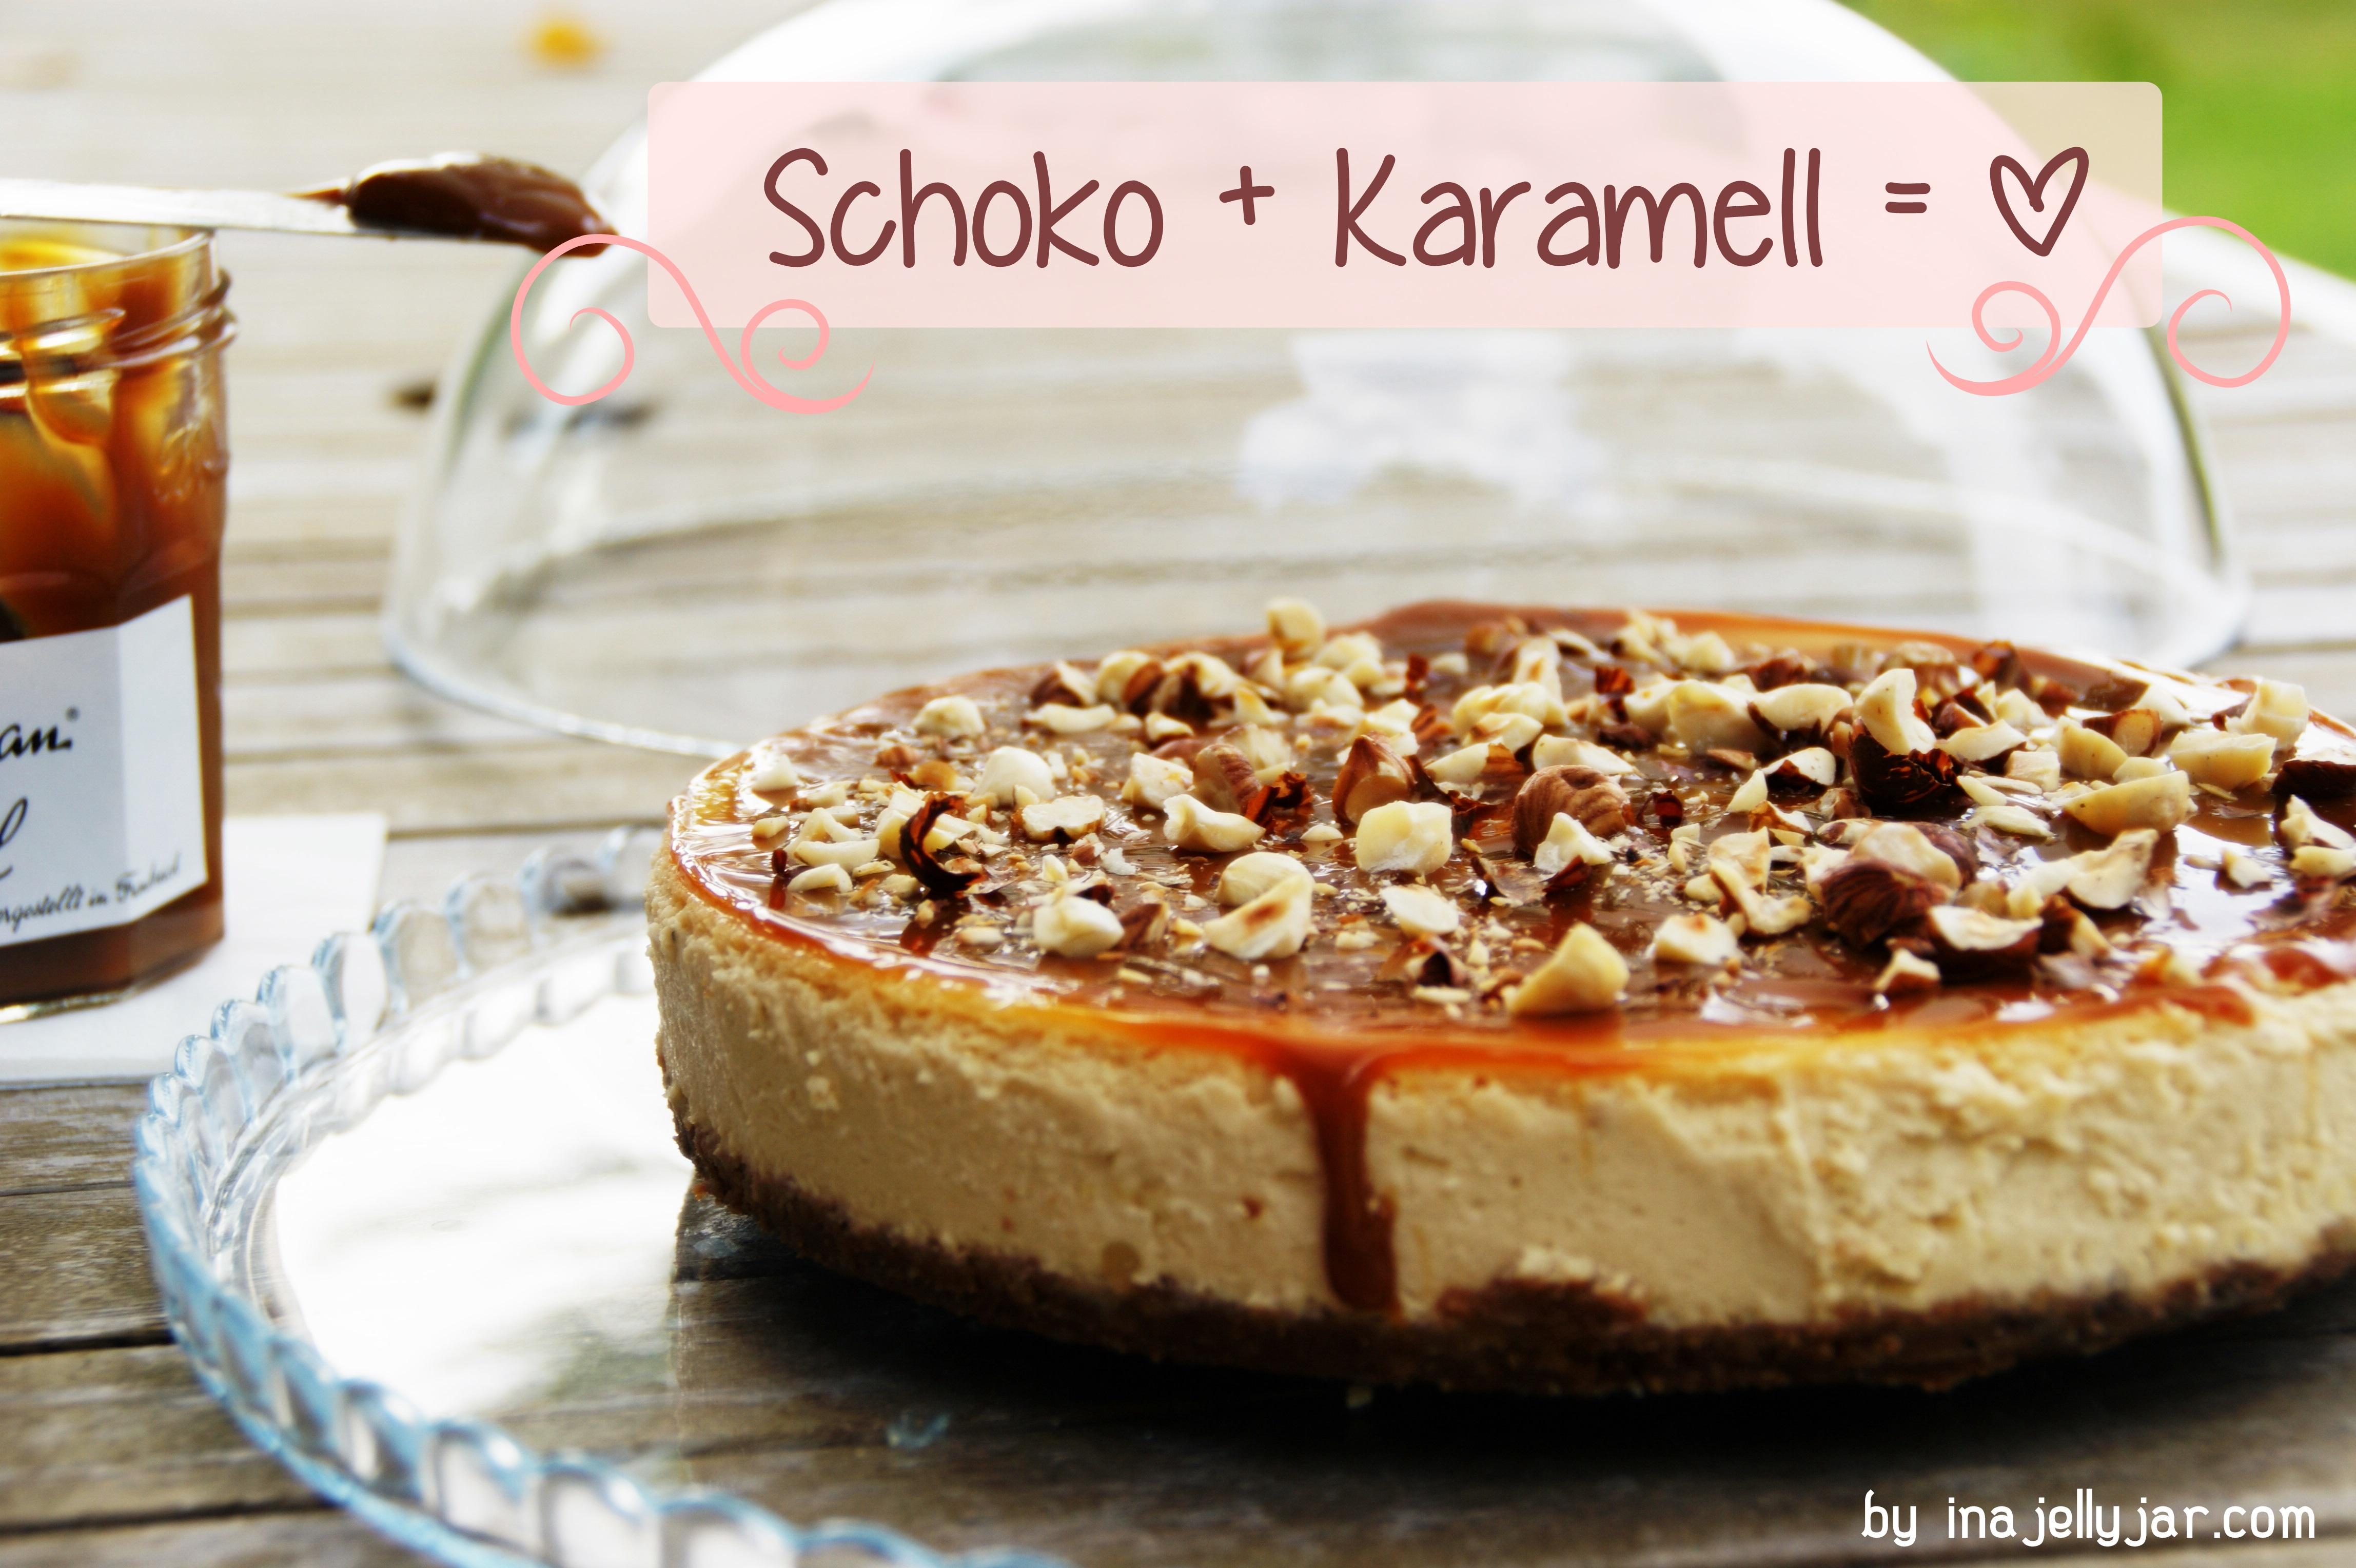 Schoko-Karamell Cheesecake